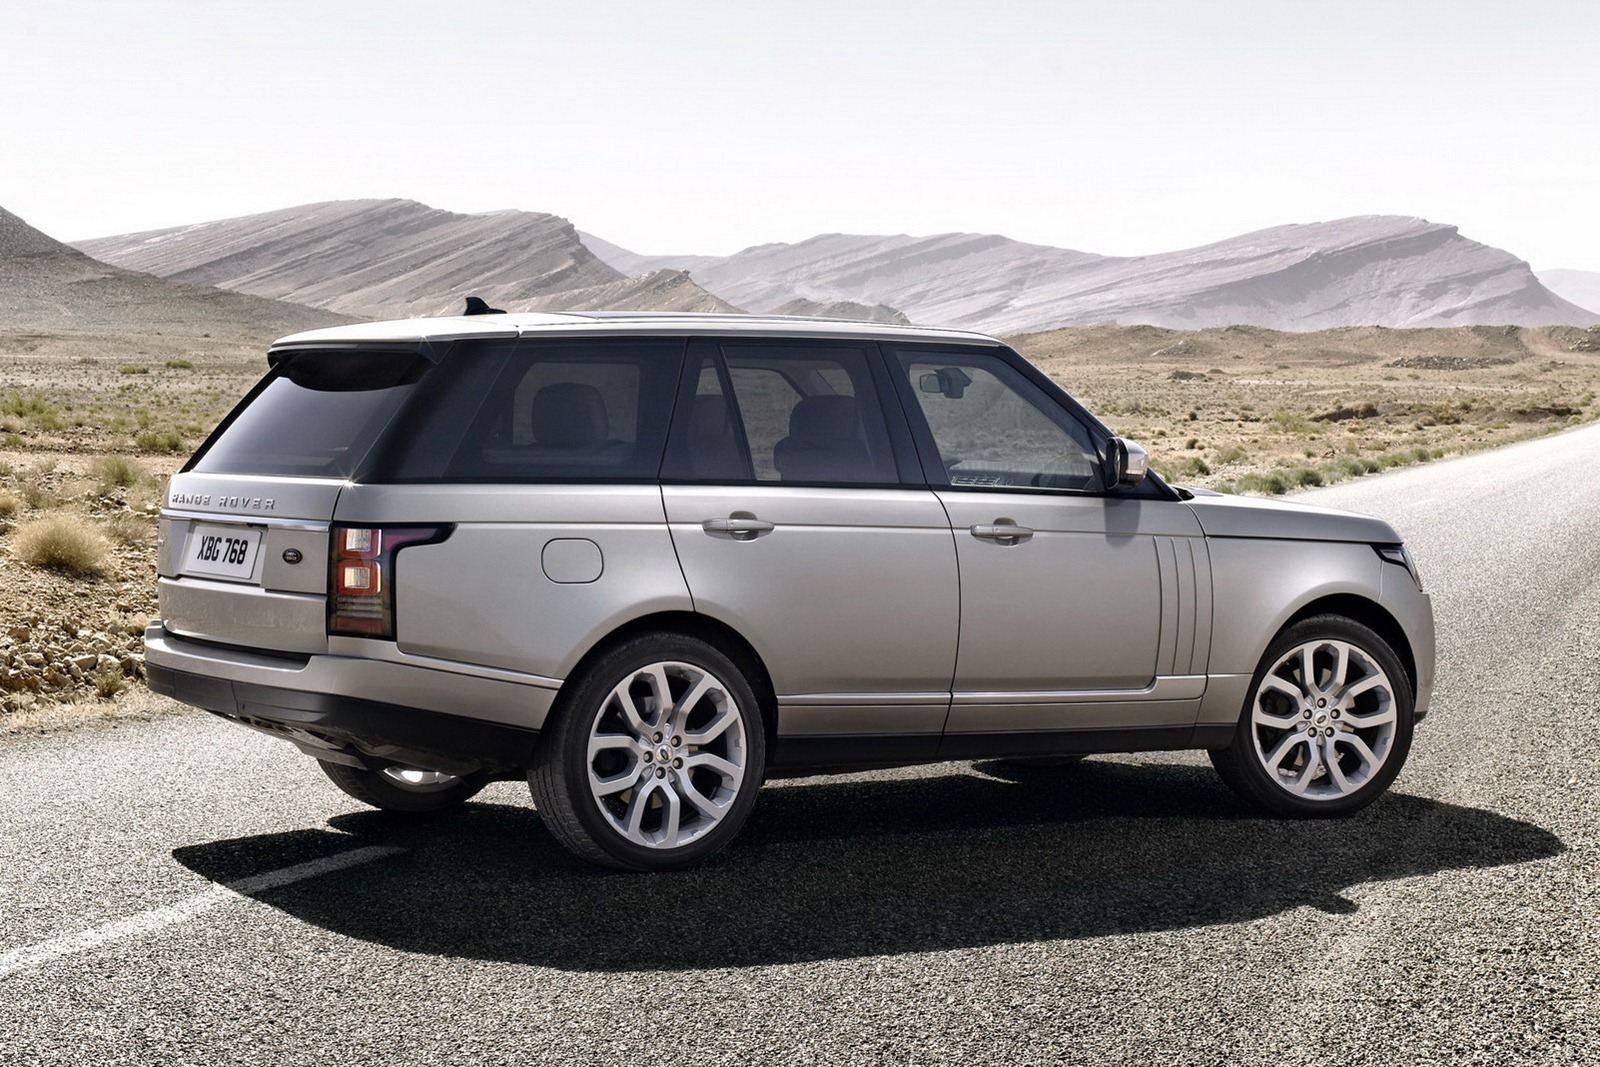 2013-Range-Rover-SUV-42